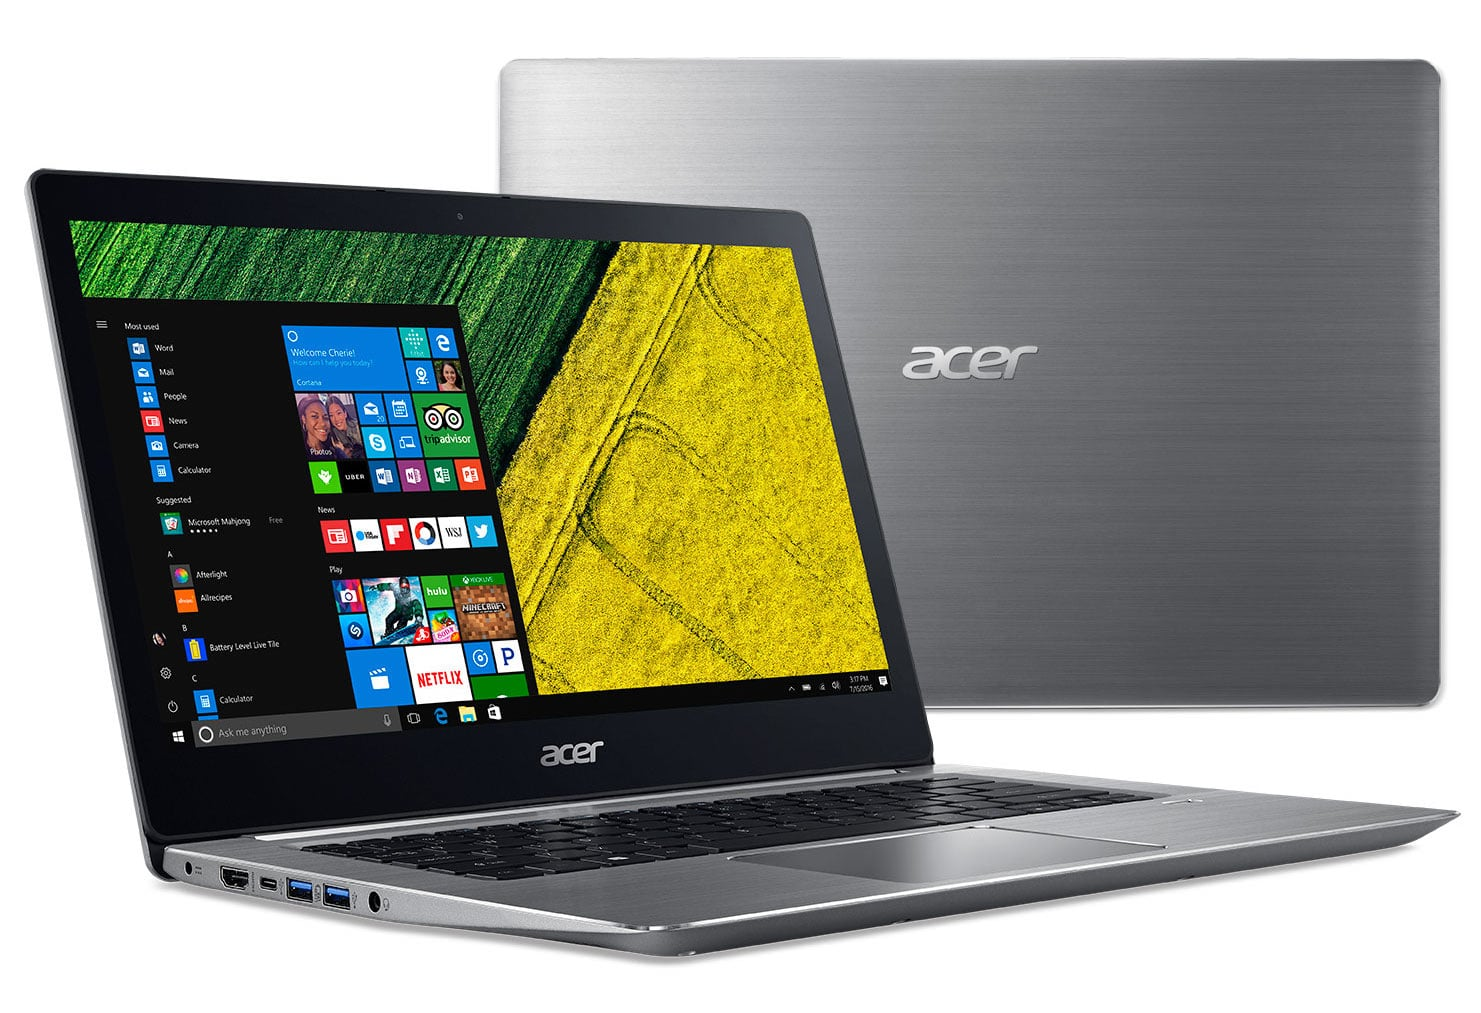 Acer Swift 3 SF314-52-70AR, ultrabook 14 pouces Full IPS i7 SSD256 à 855€